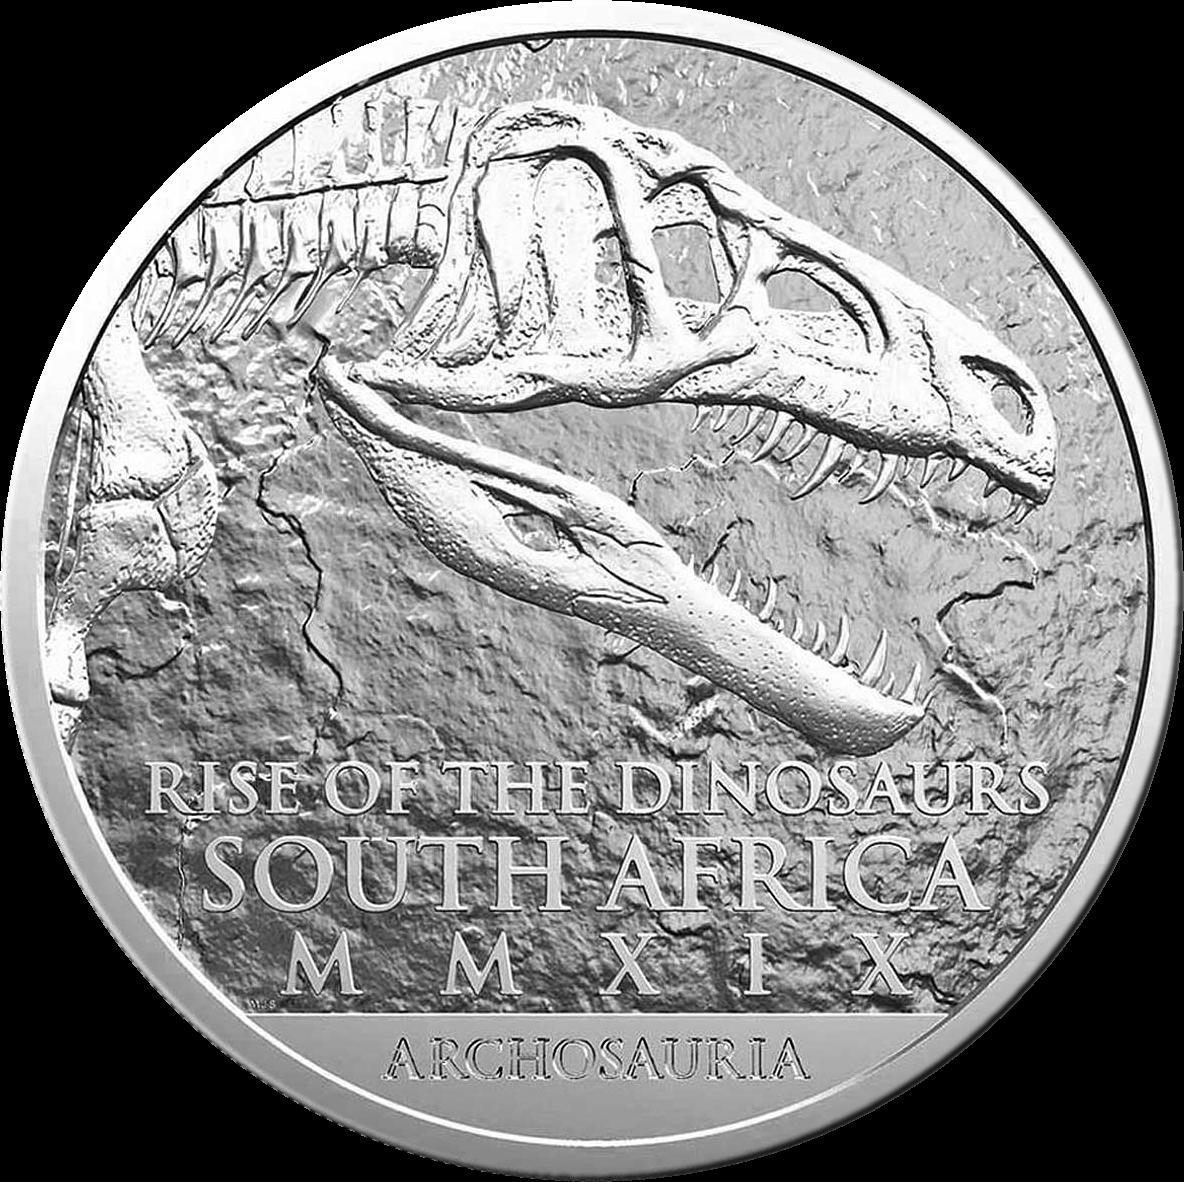 ЮАР монета 25 рандов Эупаркерия, реверс